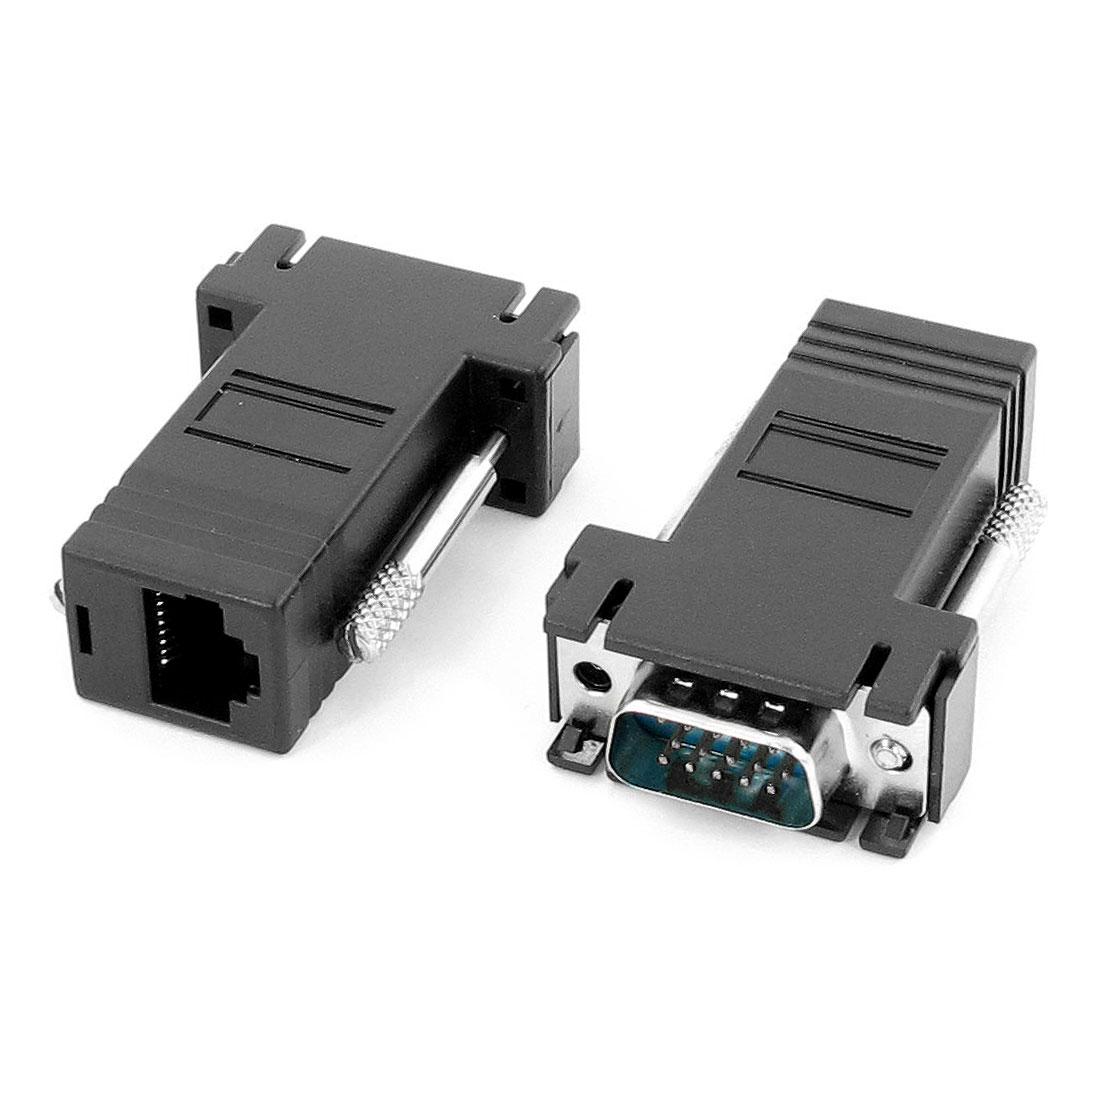 HD 15 Pin Male to RJ45 Female Network Adapter Black 2 Pcs